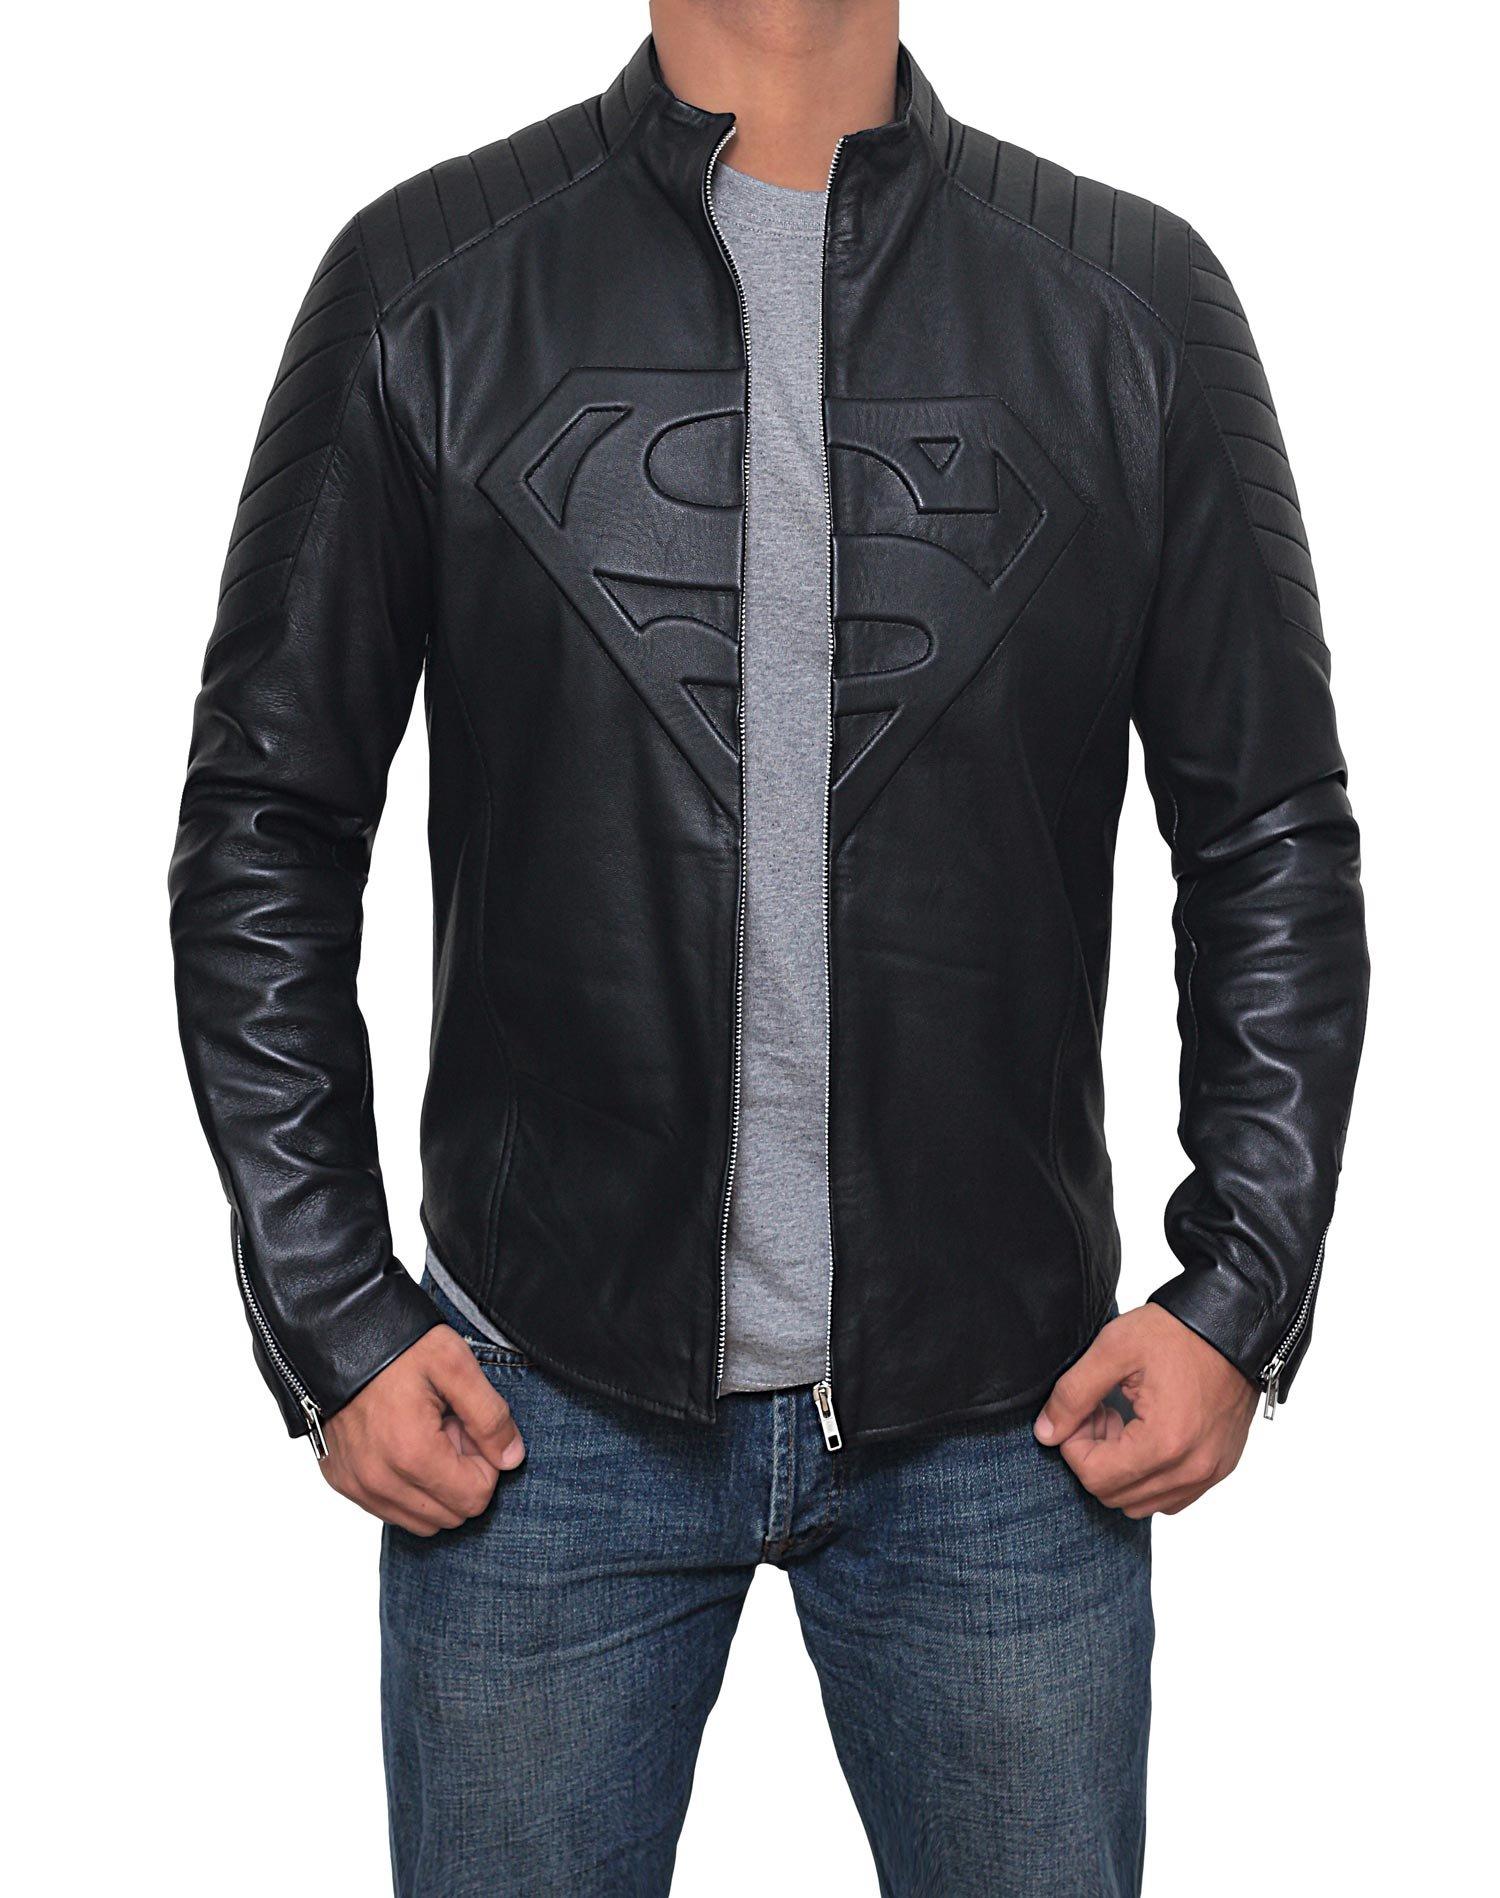 Mens Black Superman Leather Slim Fit Jacket (Superman Jacket, XL) by Decrum (Image #3)